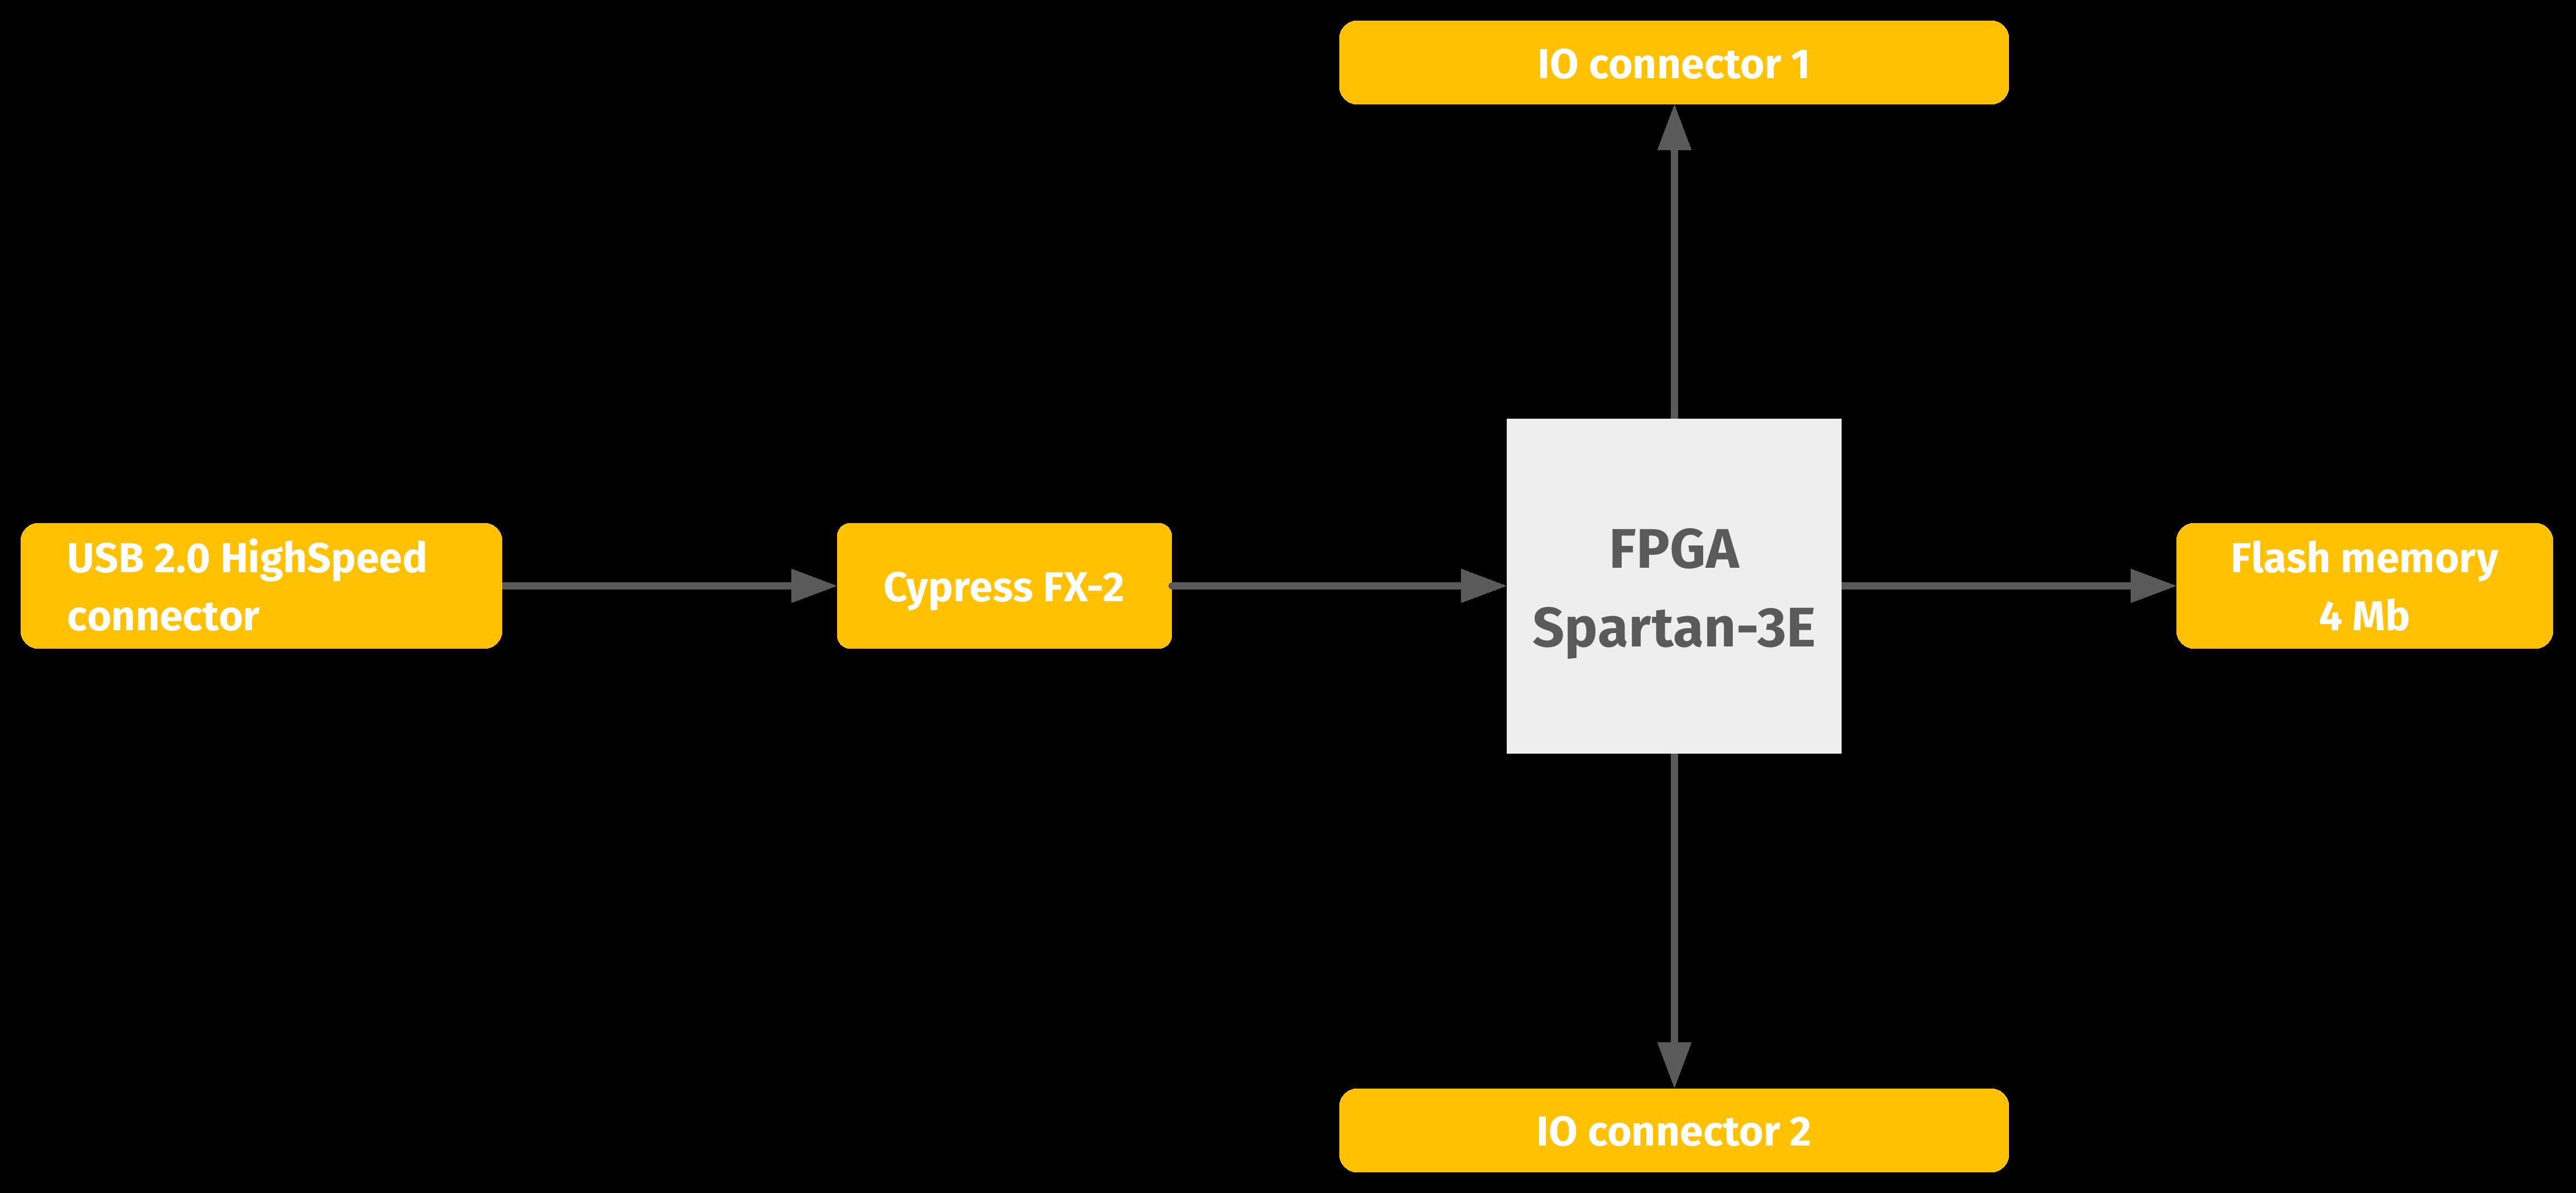 EFM-01 - CESYS Gesellschaft für angewandte Mikroelektronik